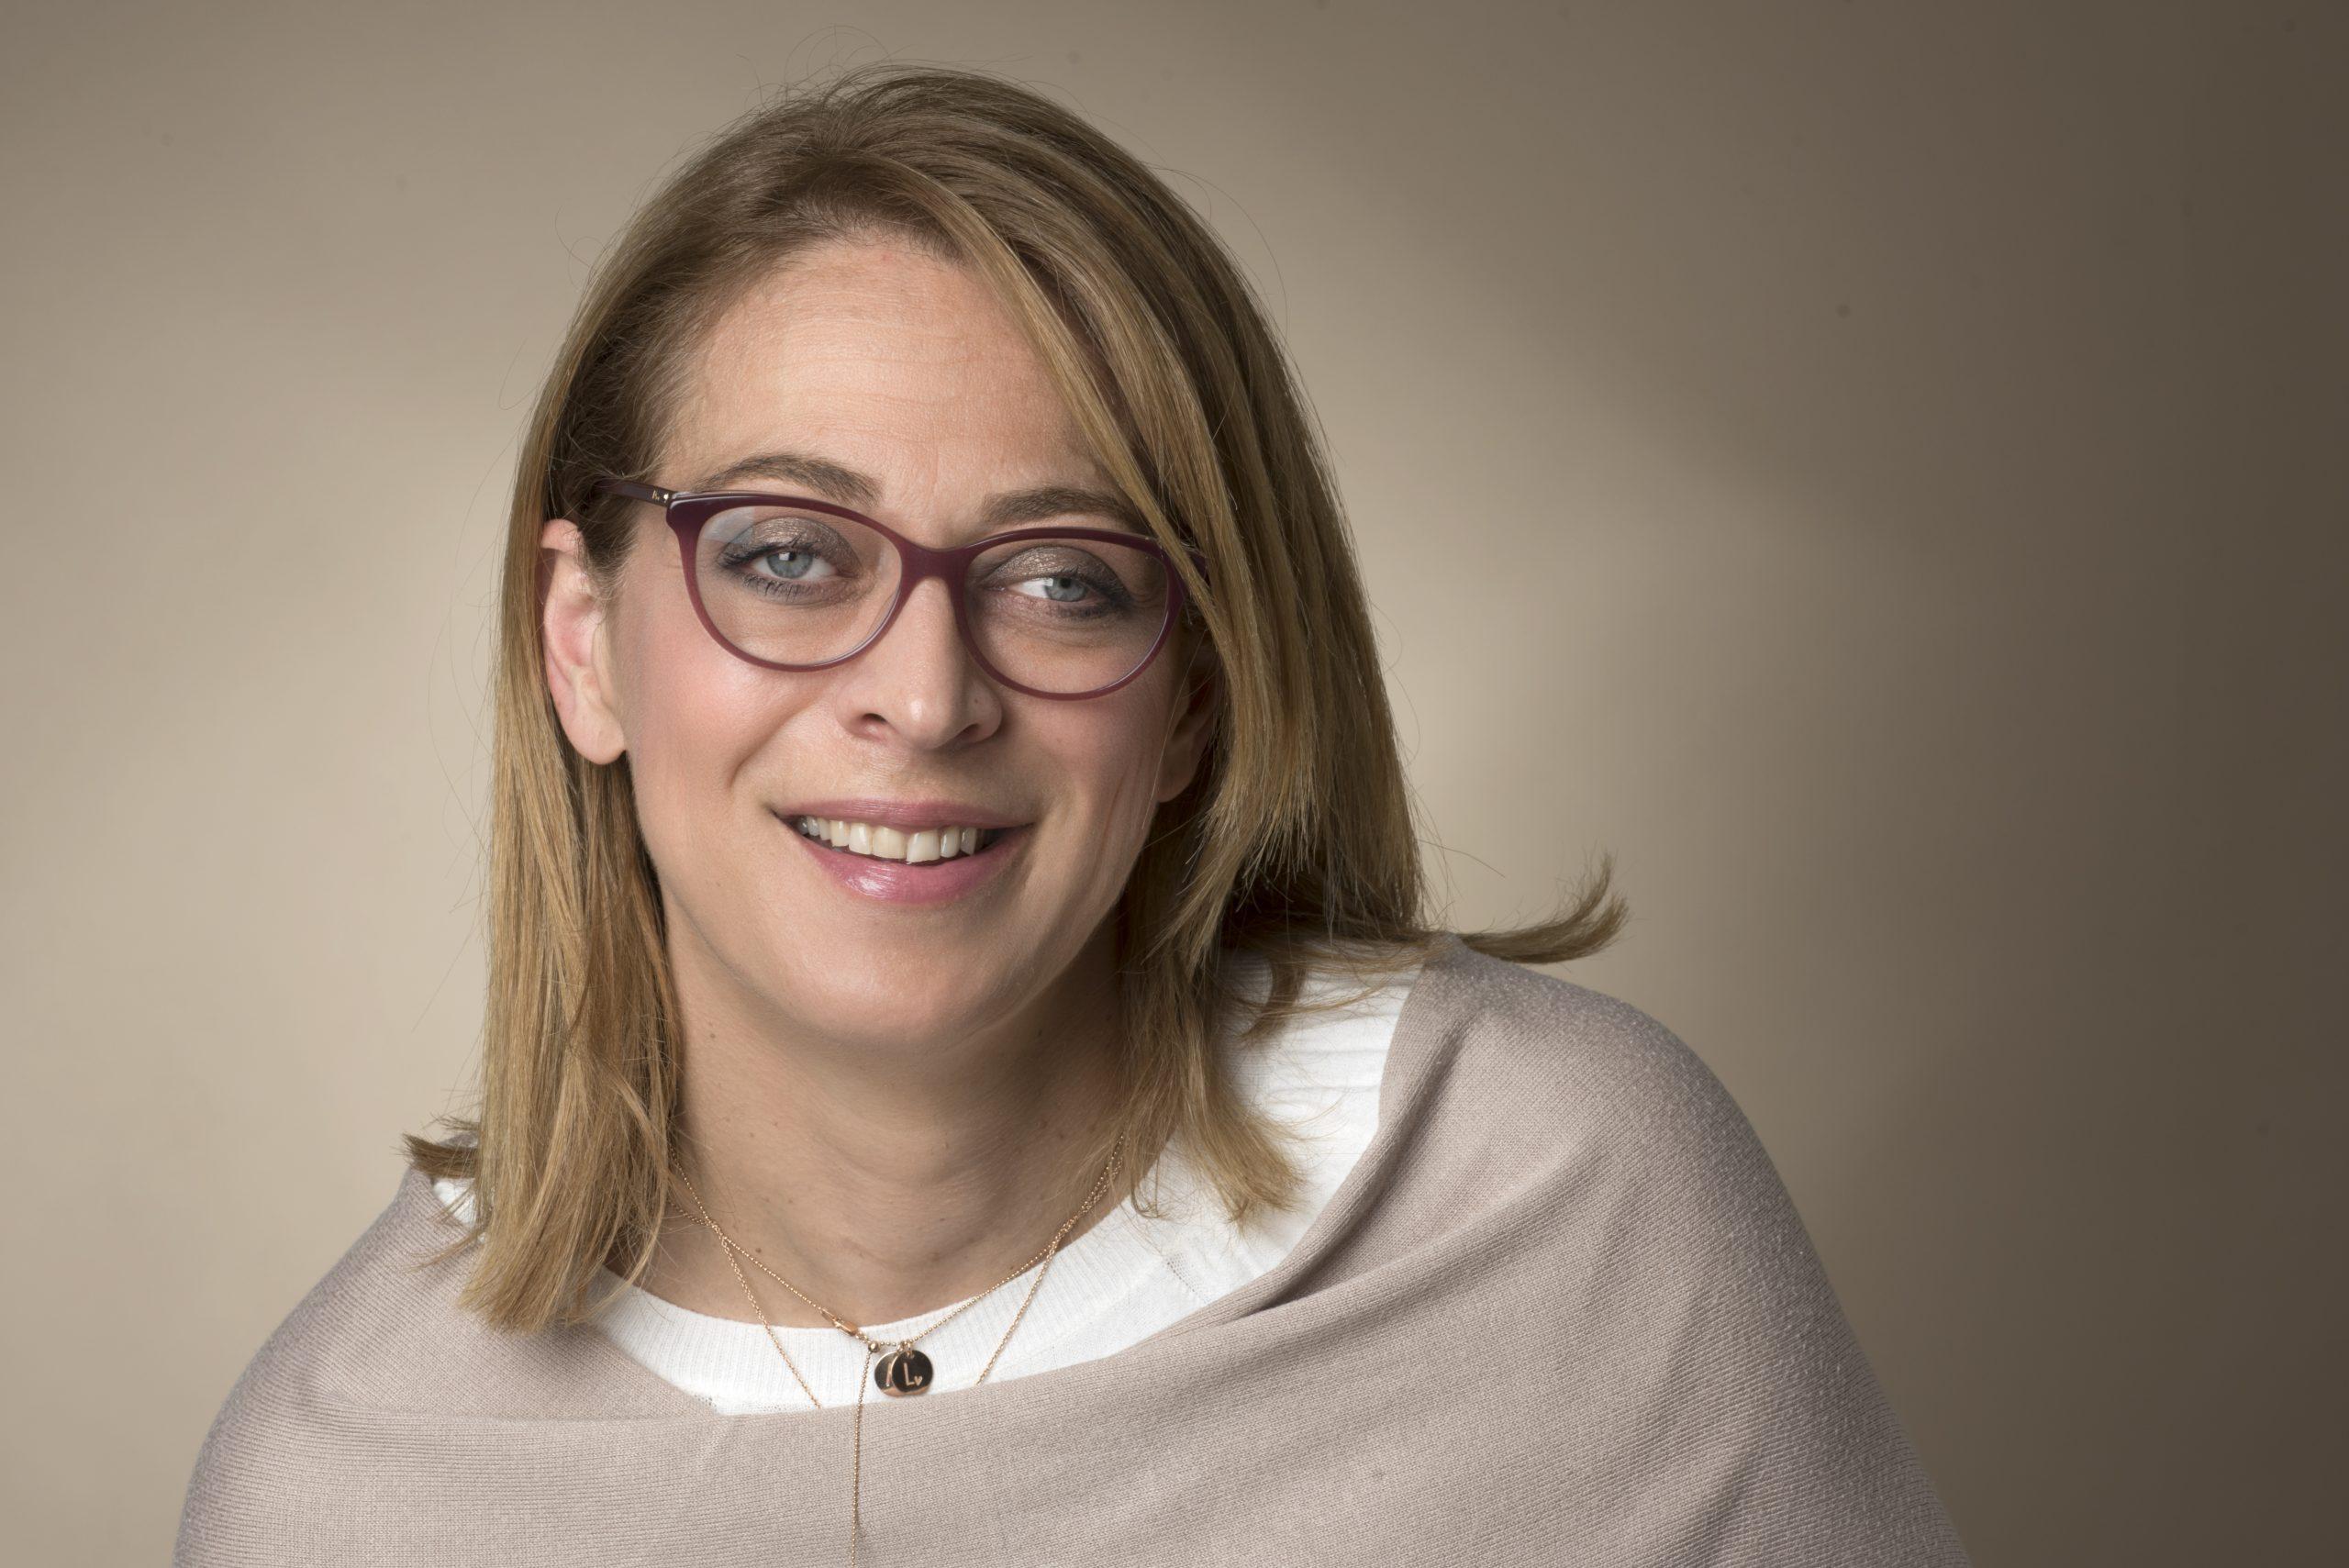 Liana Keseric, CEO Raiffeisenbank in Croatia